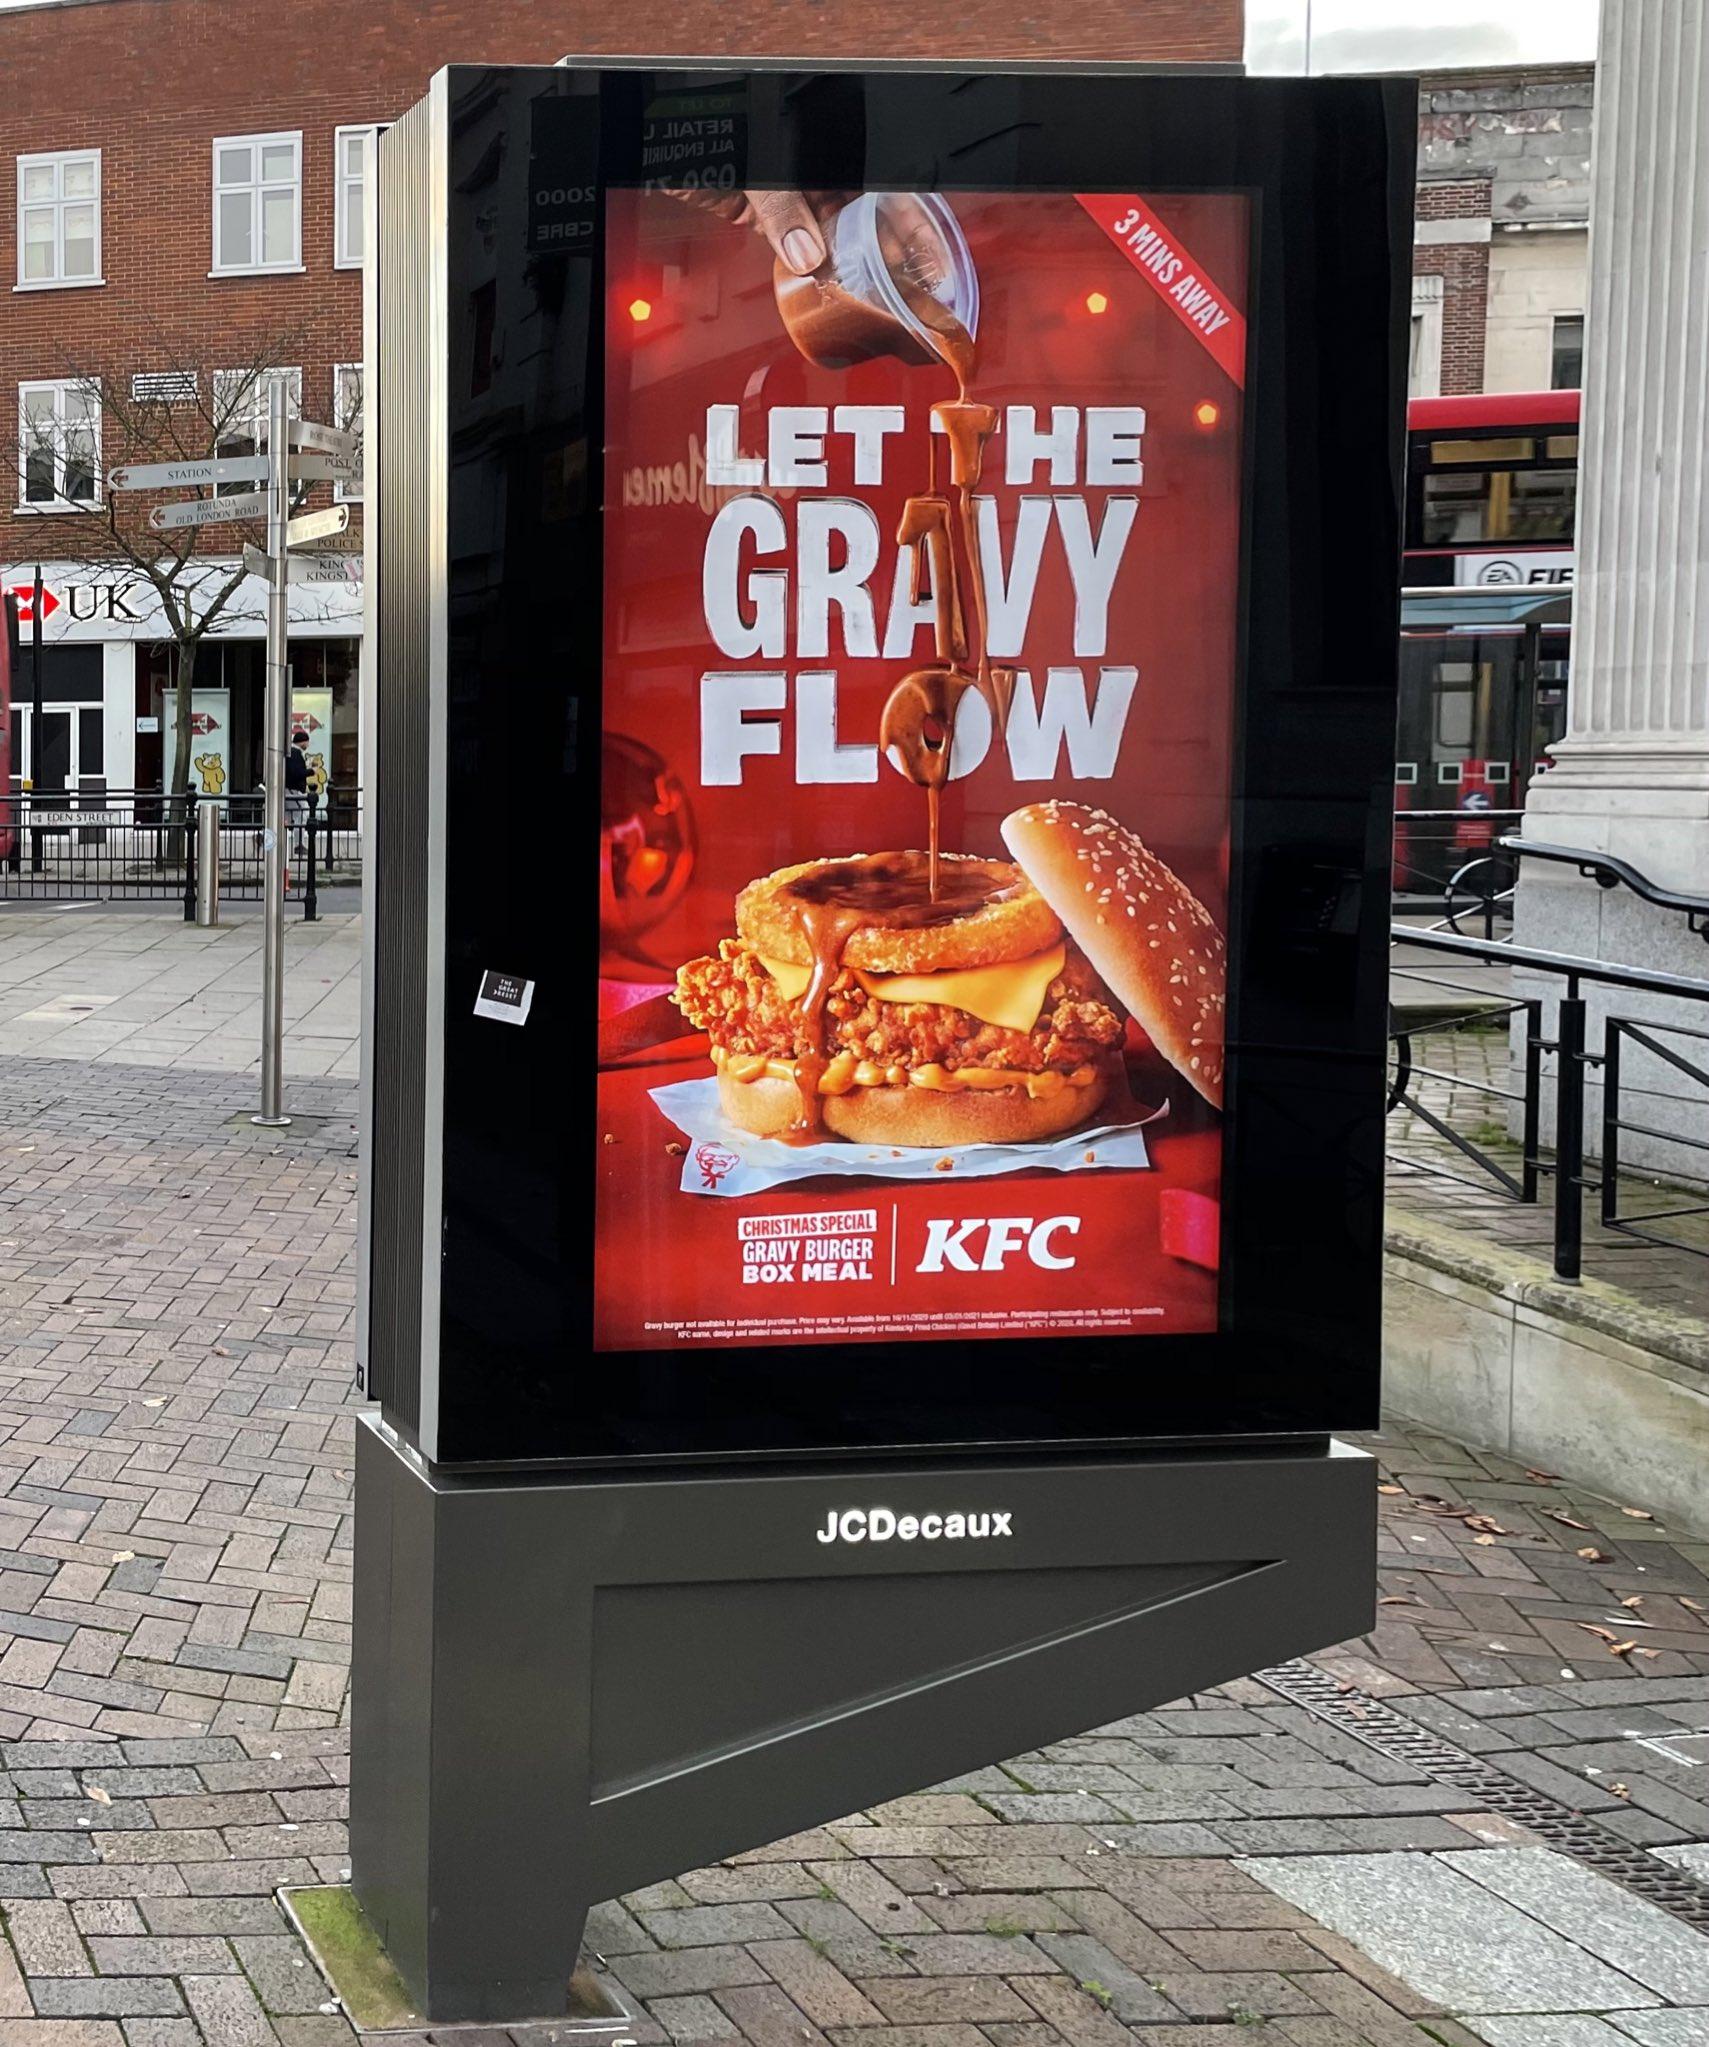 Well This Is New On Twitter Christmas Special Gravy Burger Box Meal At Kfc Kfc Uki Kfc Gravy Gravyburgerbox Burger Chicken Kfcgravy Christmas Wellthisisnew Https T Co Bygcfgmg3z